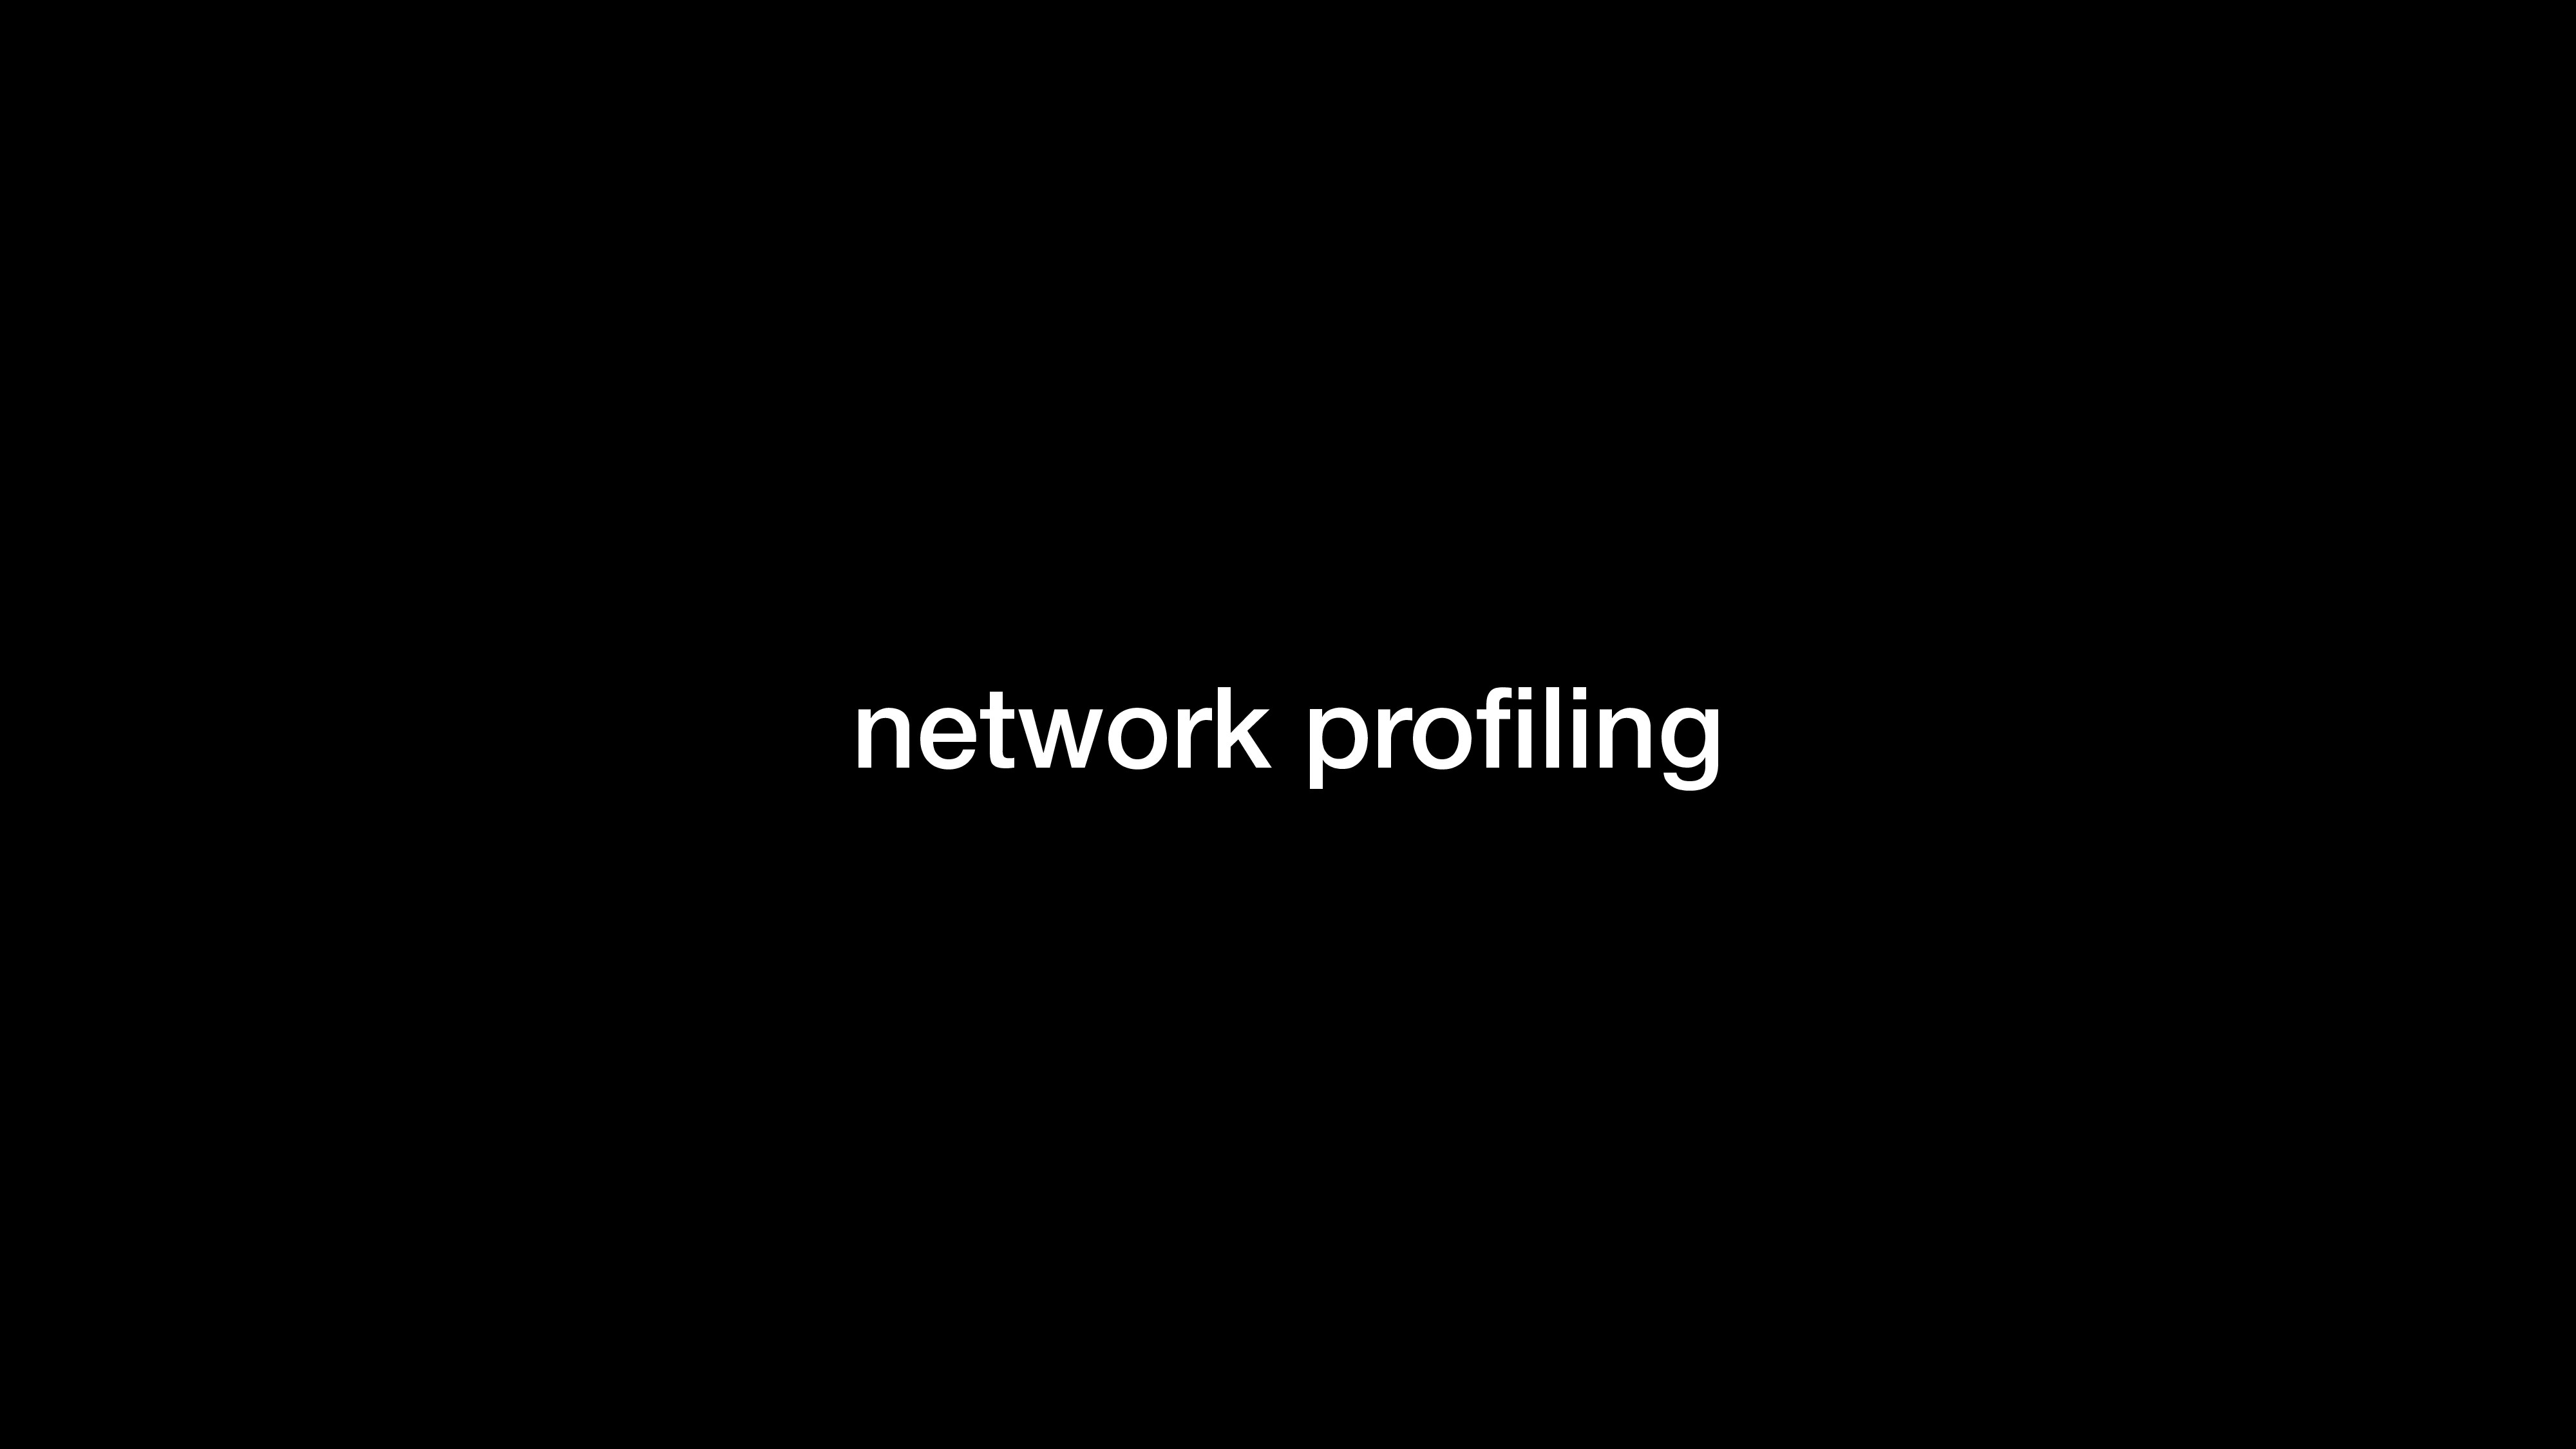 network profiling